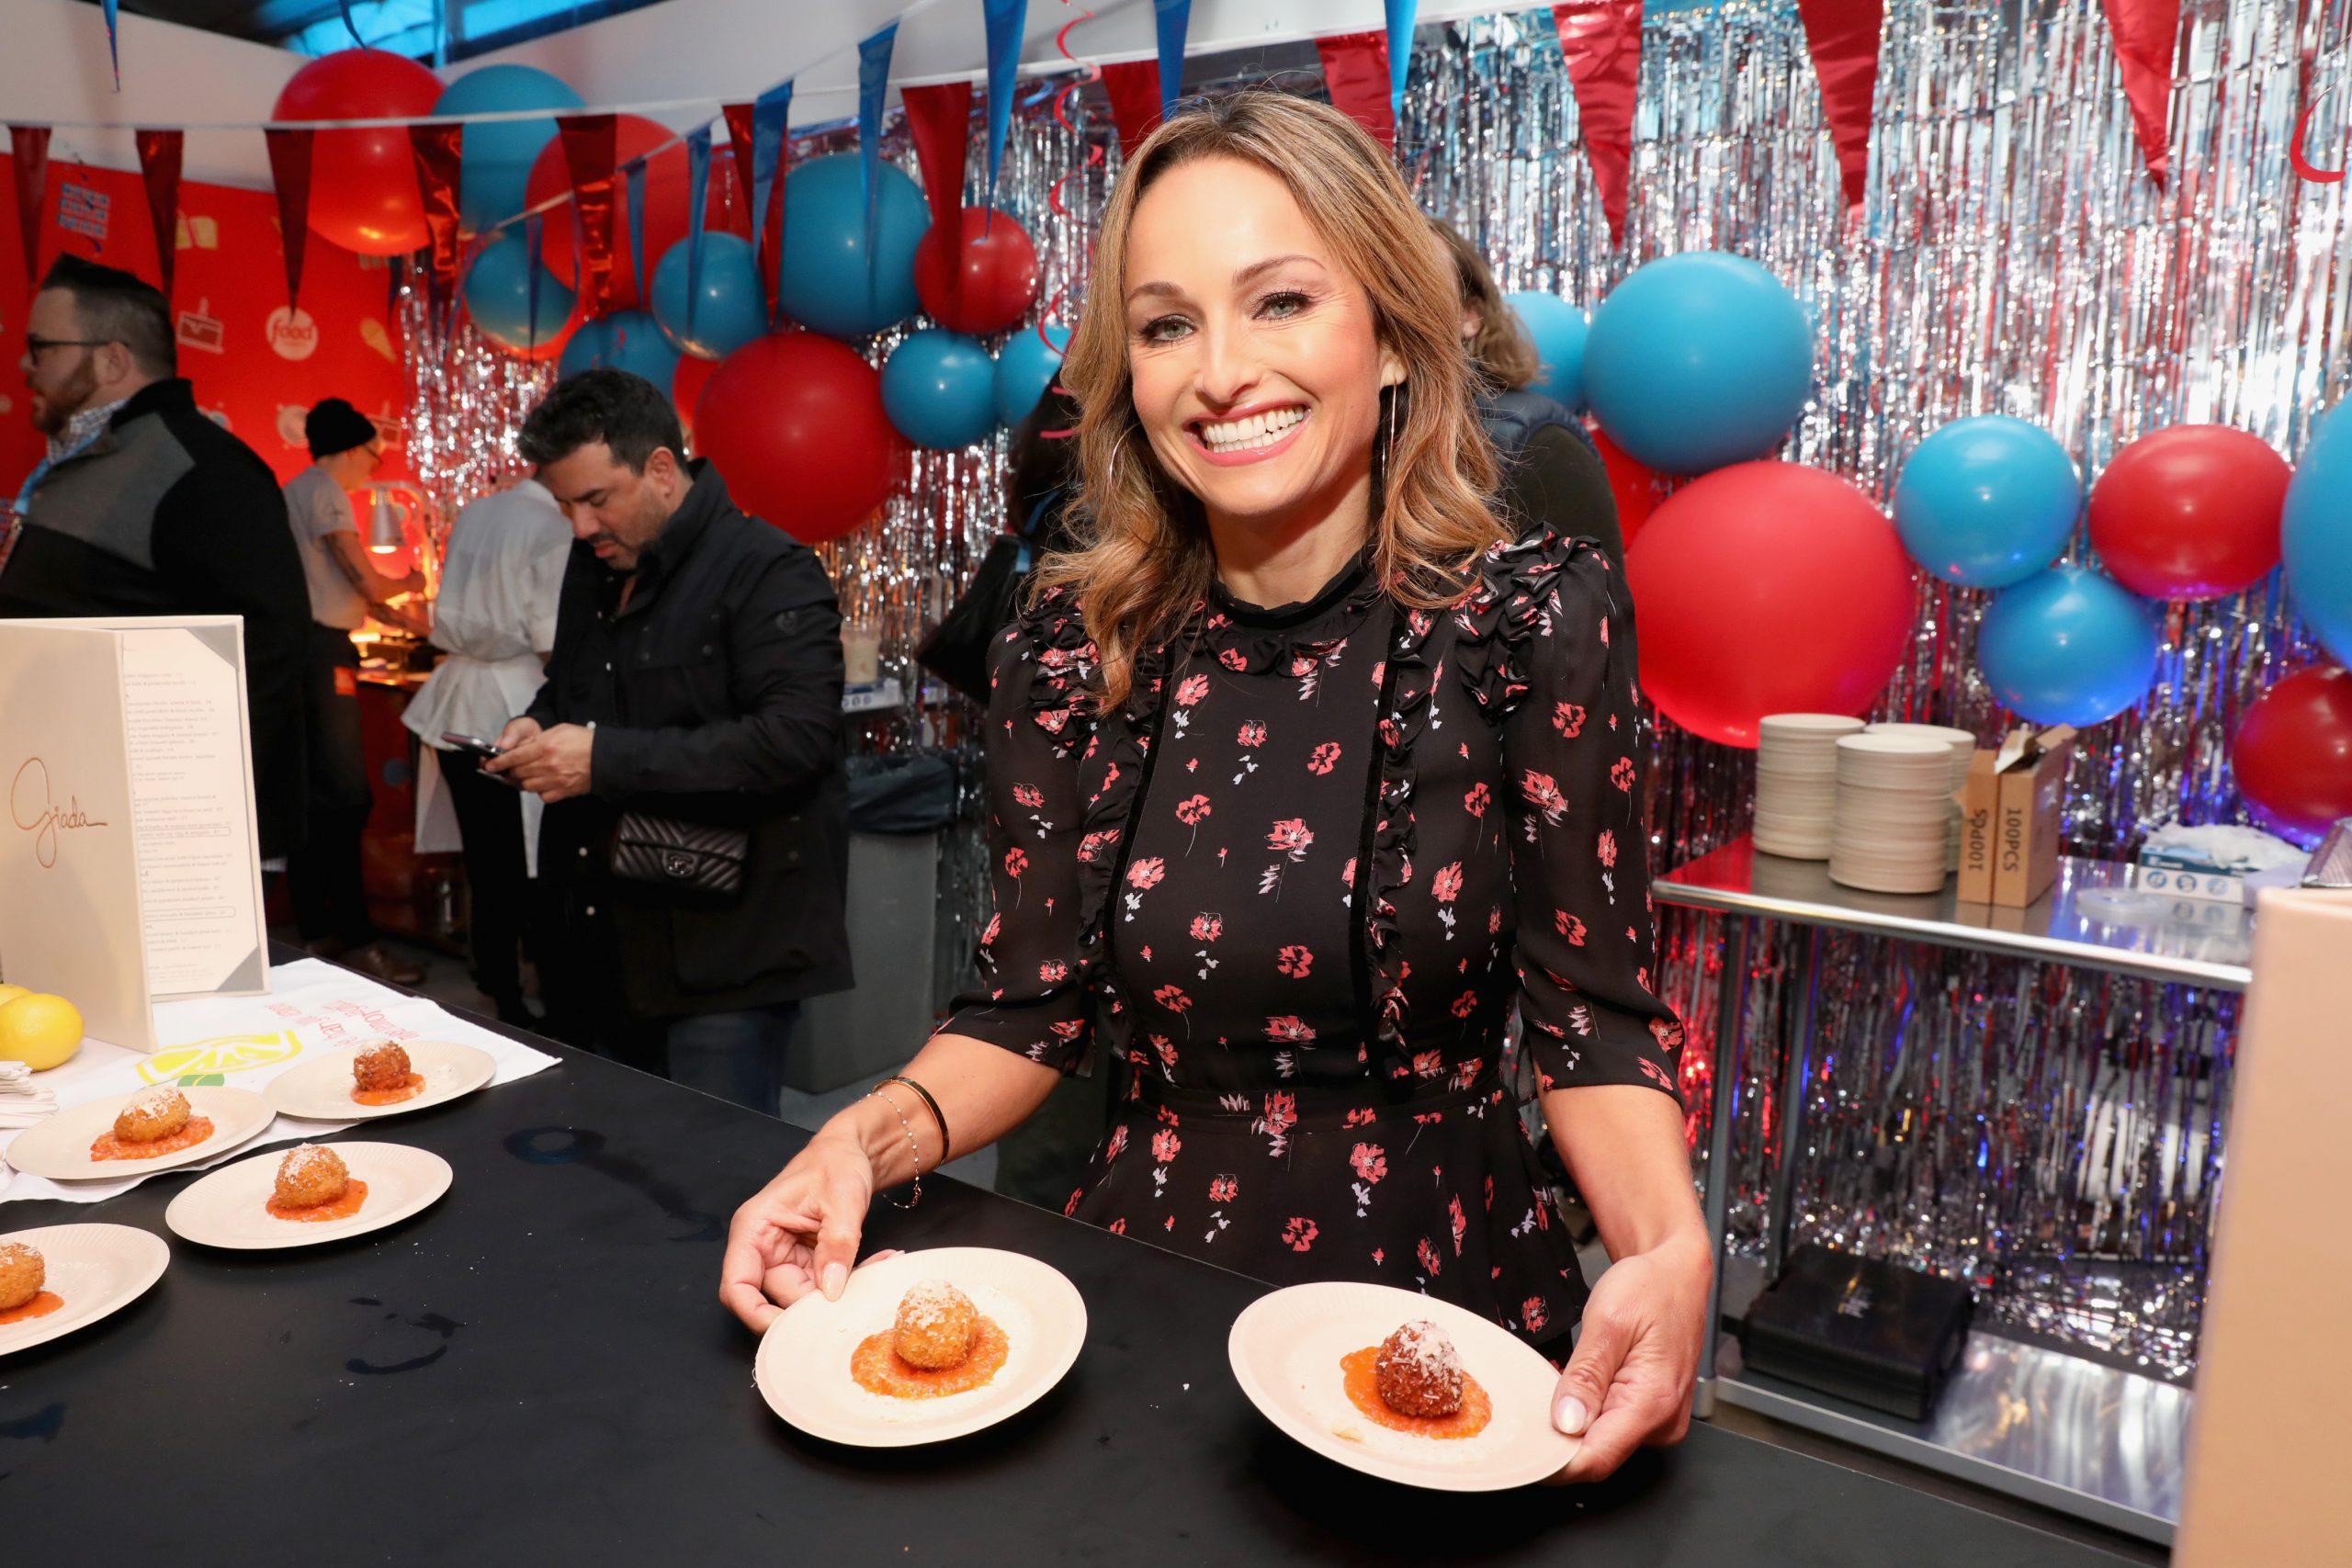 Food Network star Giada De Laurentiis